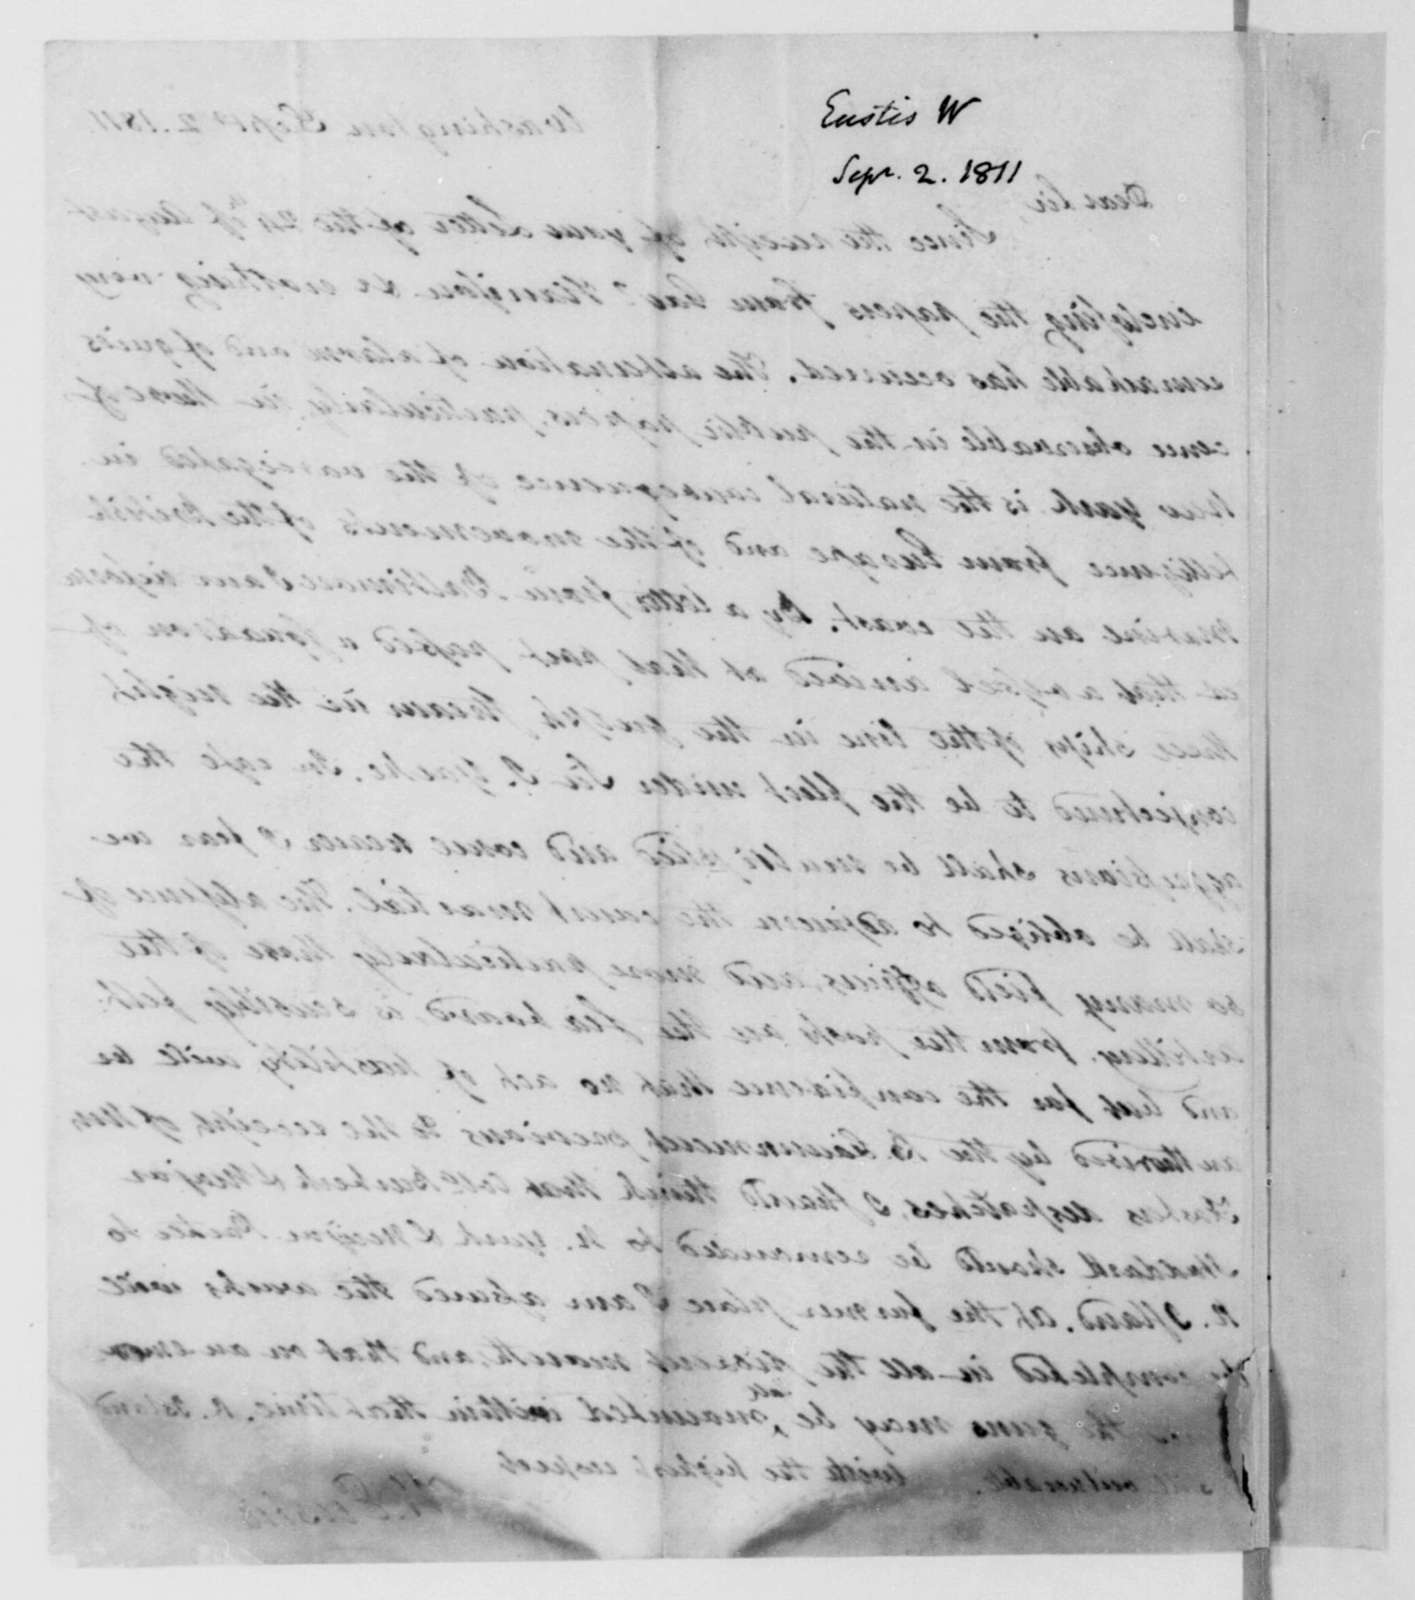 William Eustis to James Madison, September 2, 1811.